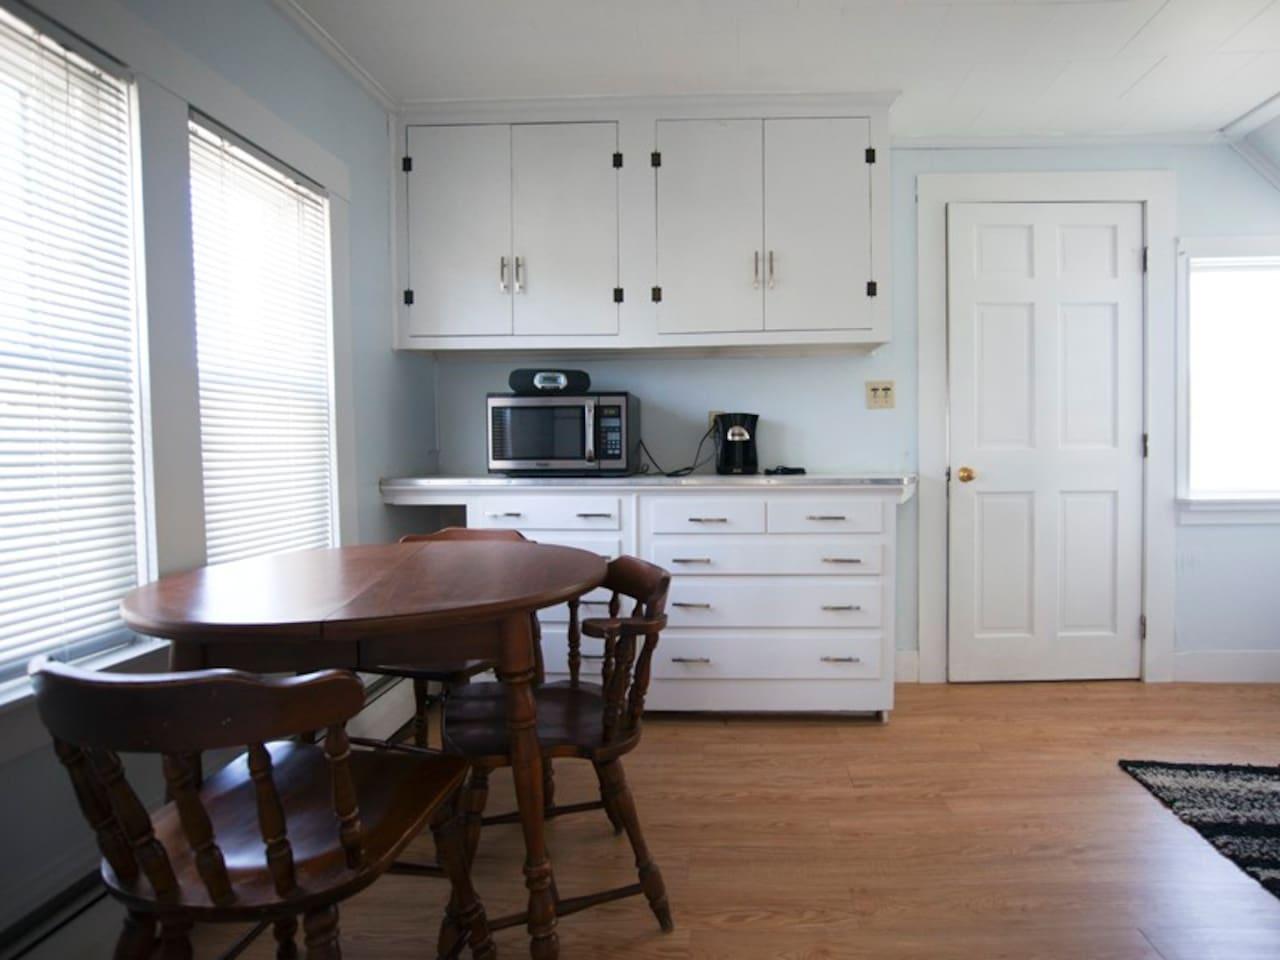 Kitchen - includes all utensils, pots & pans.